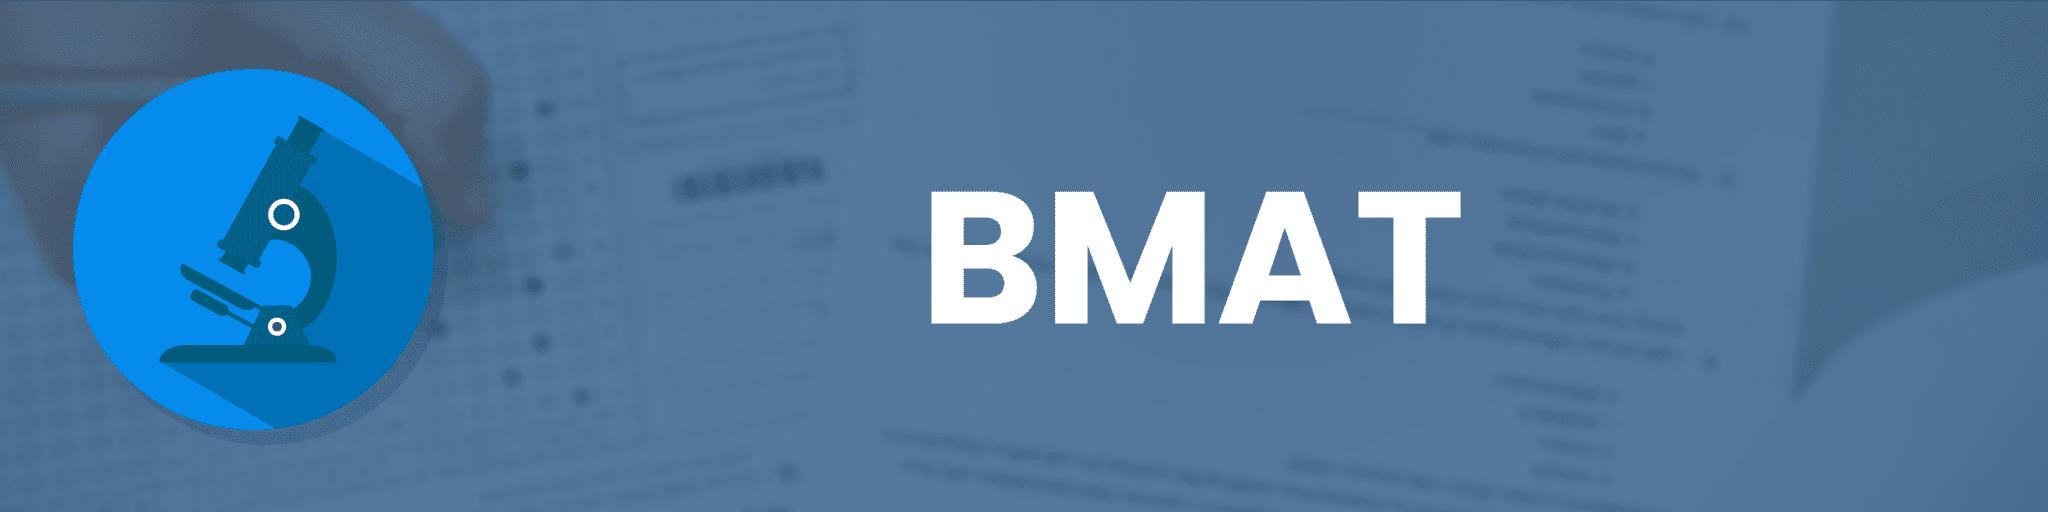 bmat - test bmat - egzamin bmat - studia za granicą - studiare all'estero - studia za granicą